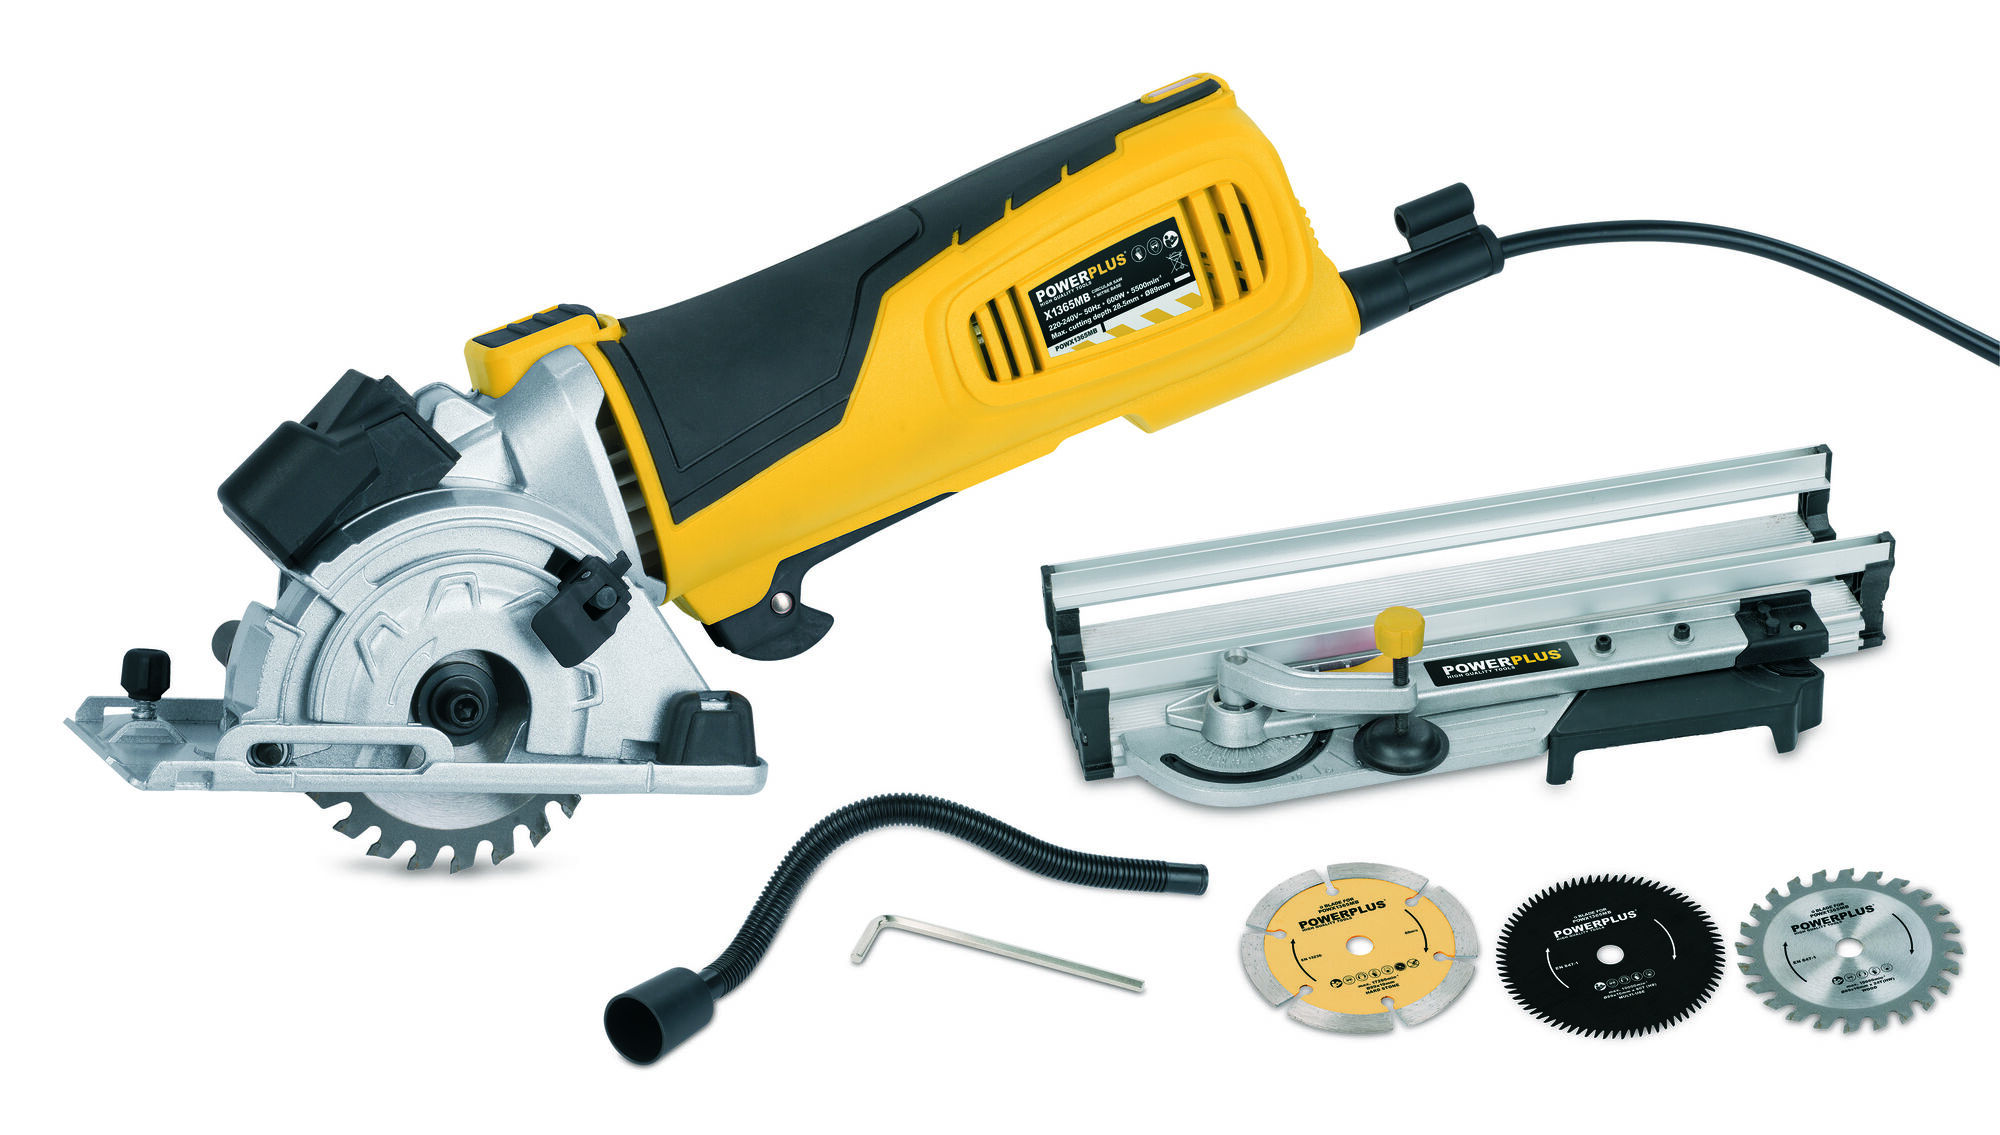 Powerplus POWX1365MB Cirkelzaag met verstekbak 600W | Cirkelzaagmachine D89mm